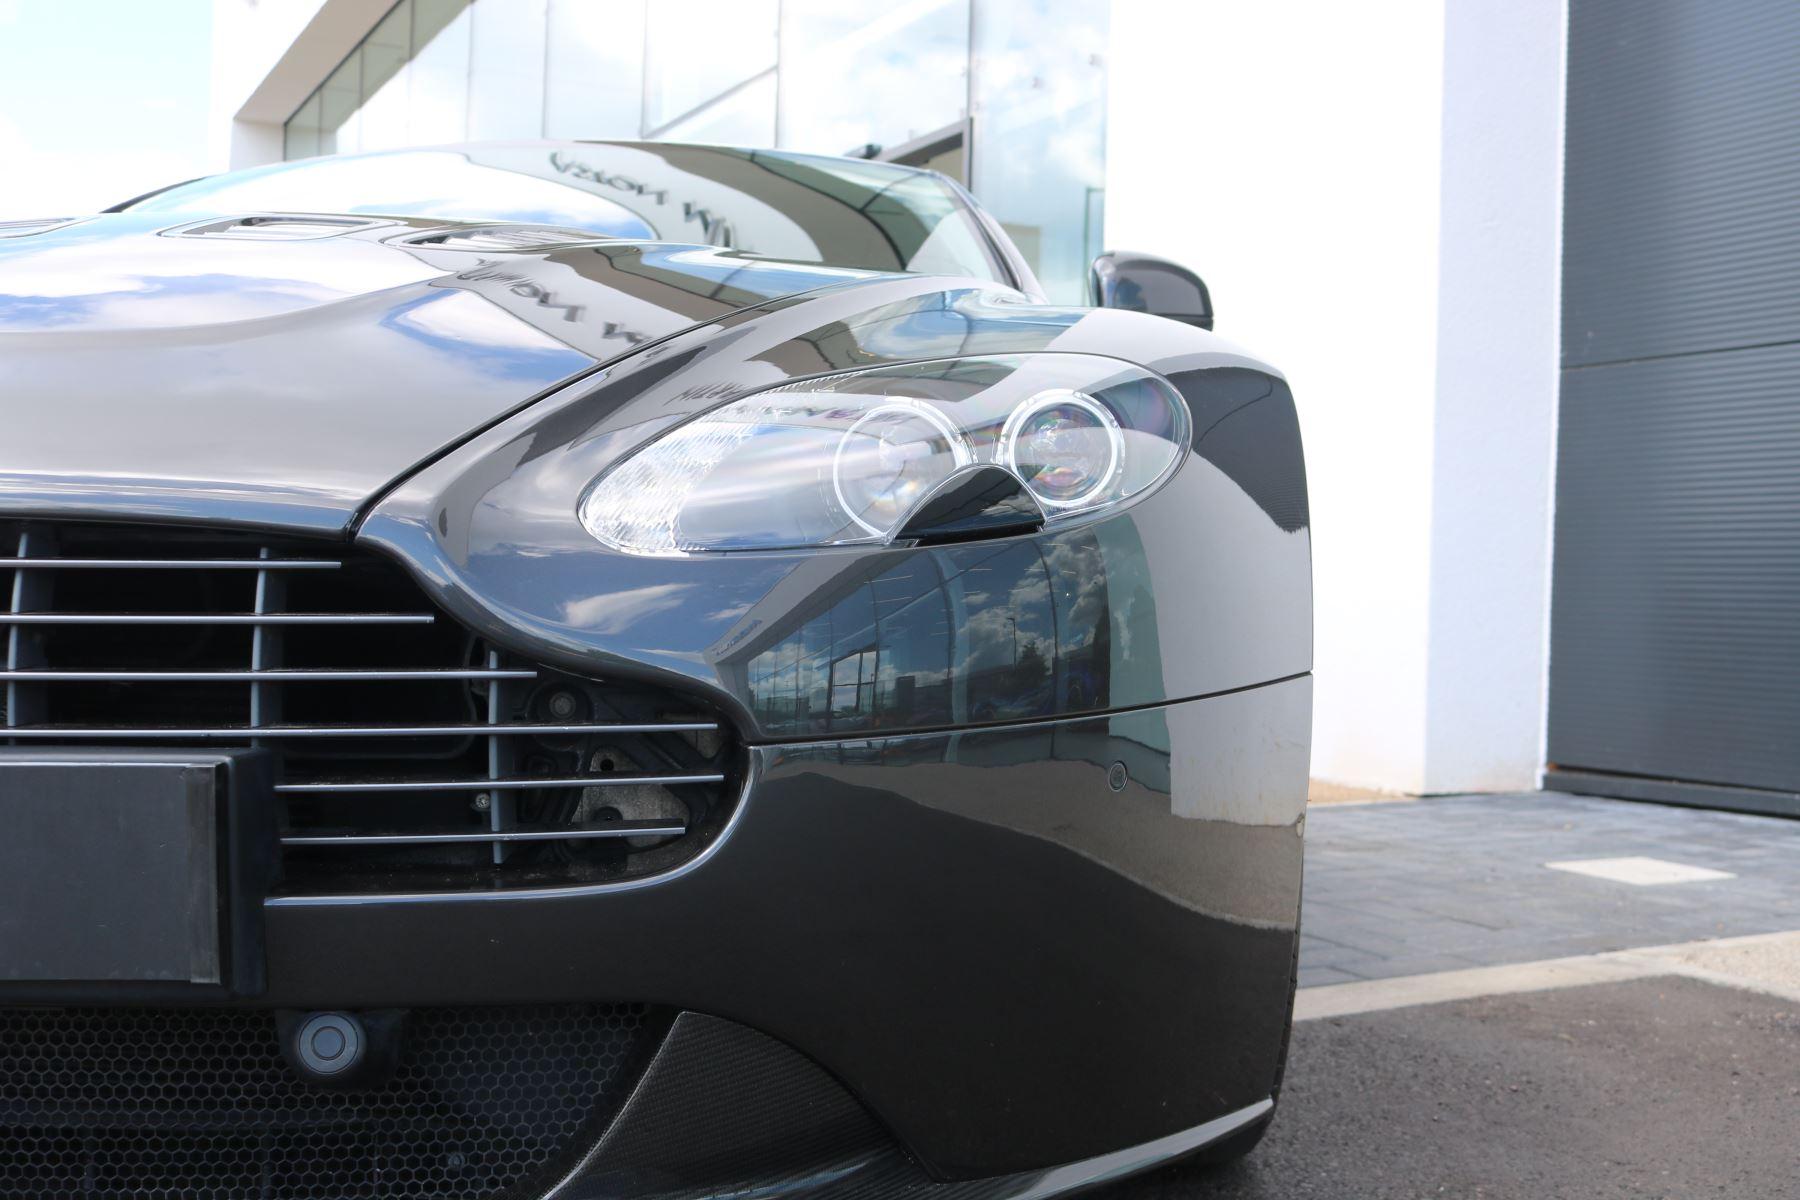 Aston Martin V12 Vantage 2dr image 12